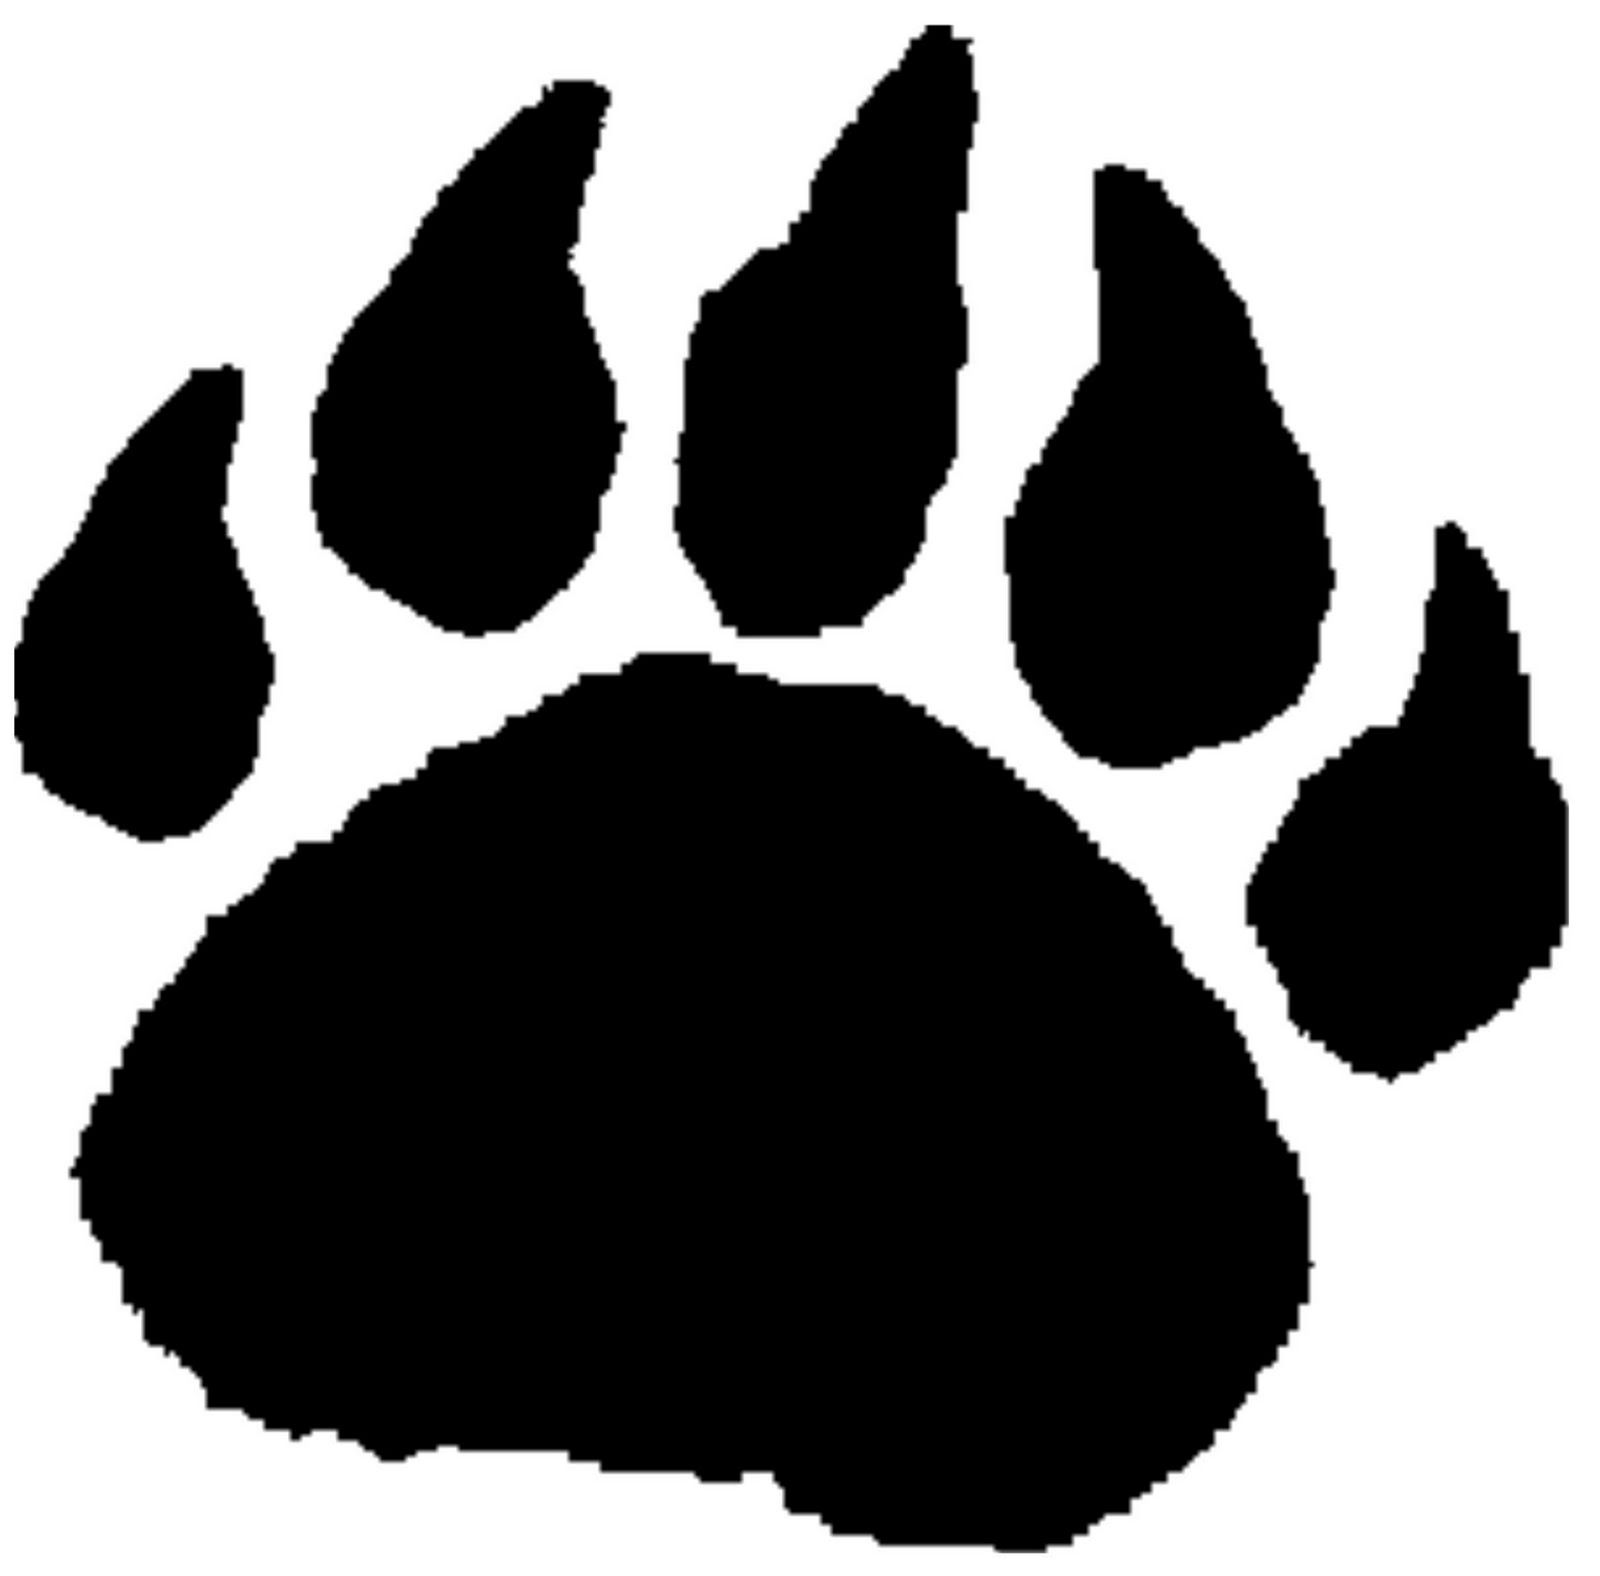 brown bear cub outline clipart  Google Search  bears  Pinterest